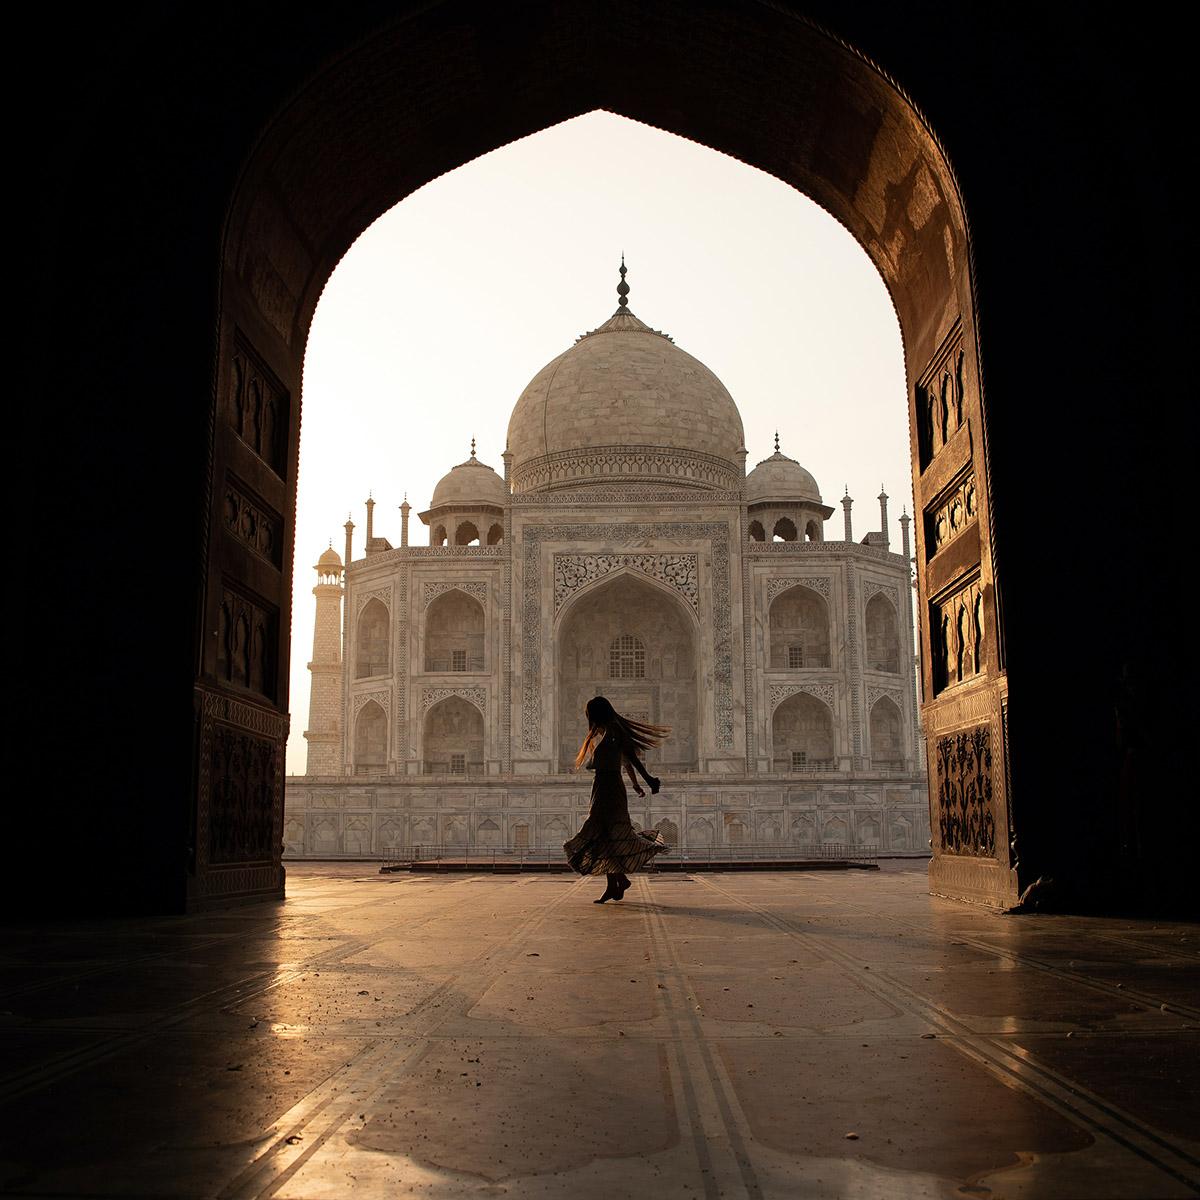 Bucket List Travel 2021 - Taj Mahal, India